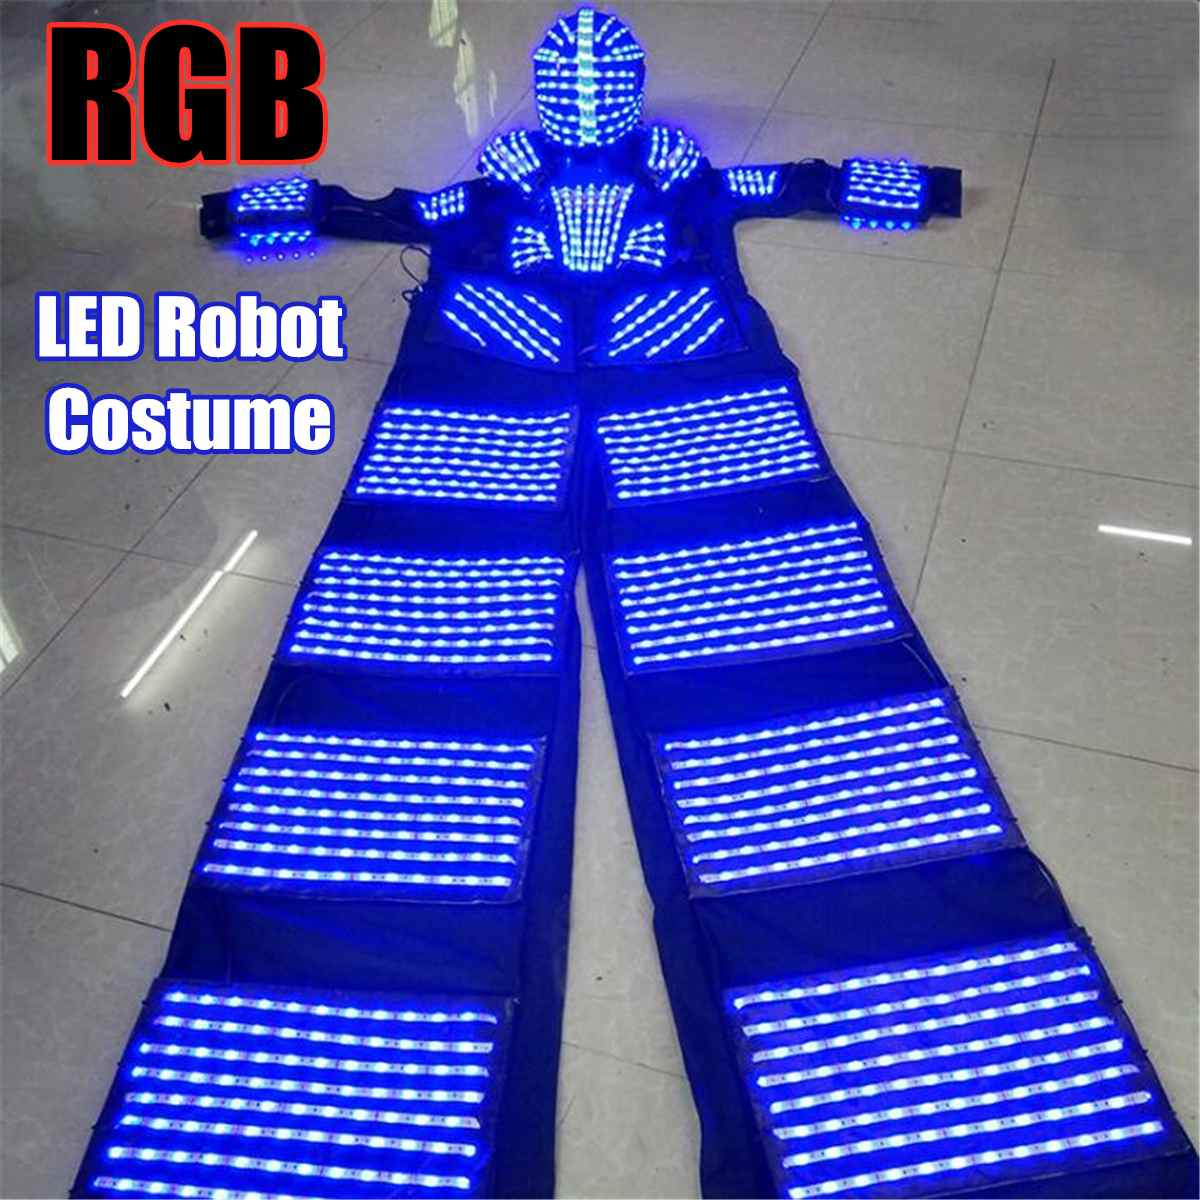 Stelten Walker RGB LED Licht LED Danser ~ Kostuum LED Robot Pak Voor Party Prestaties Elektronische Muziek Festival ~ DJ tonen - 2